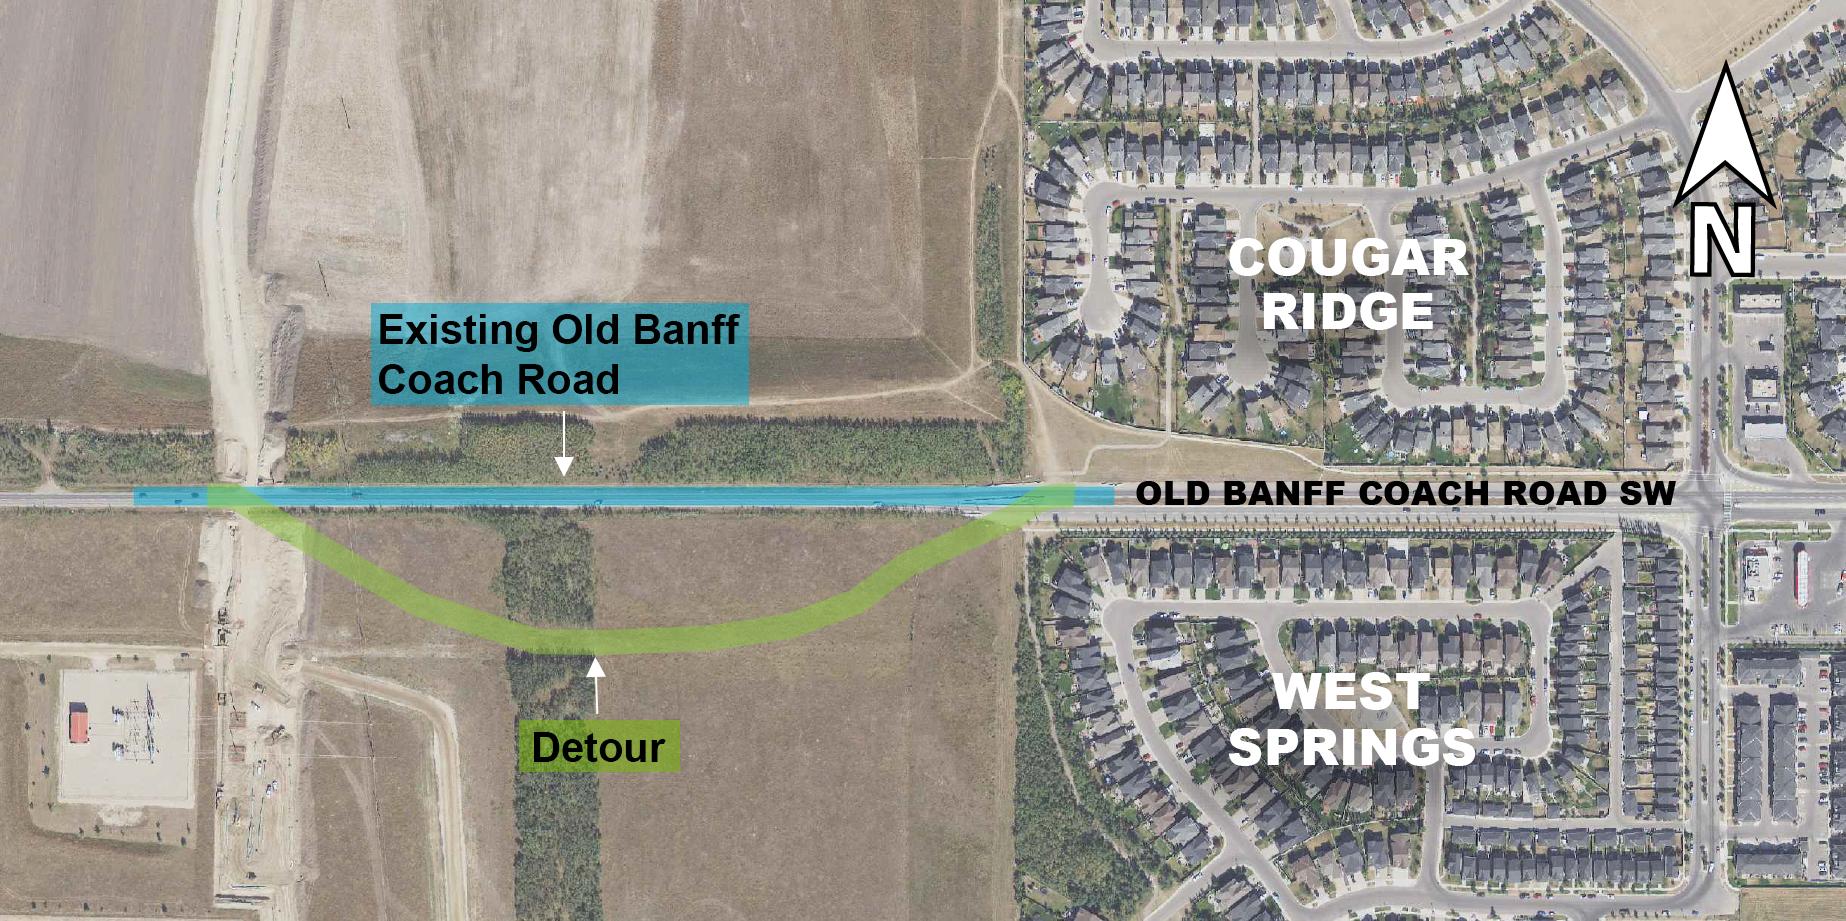 Map of Old Banff Coach Road S.W. detour route